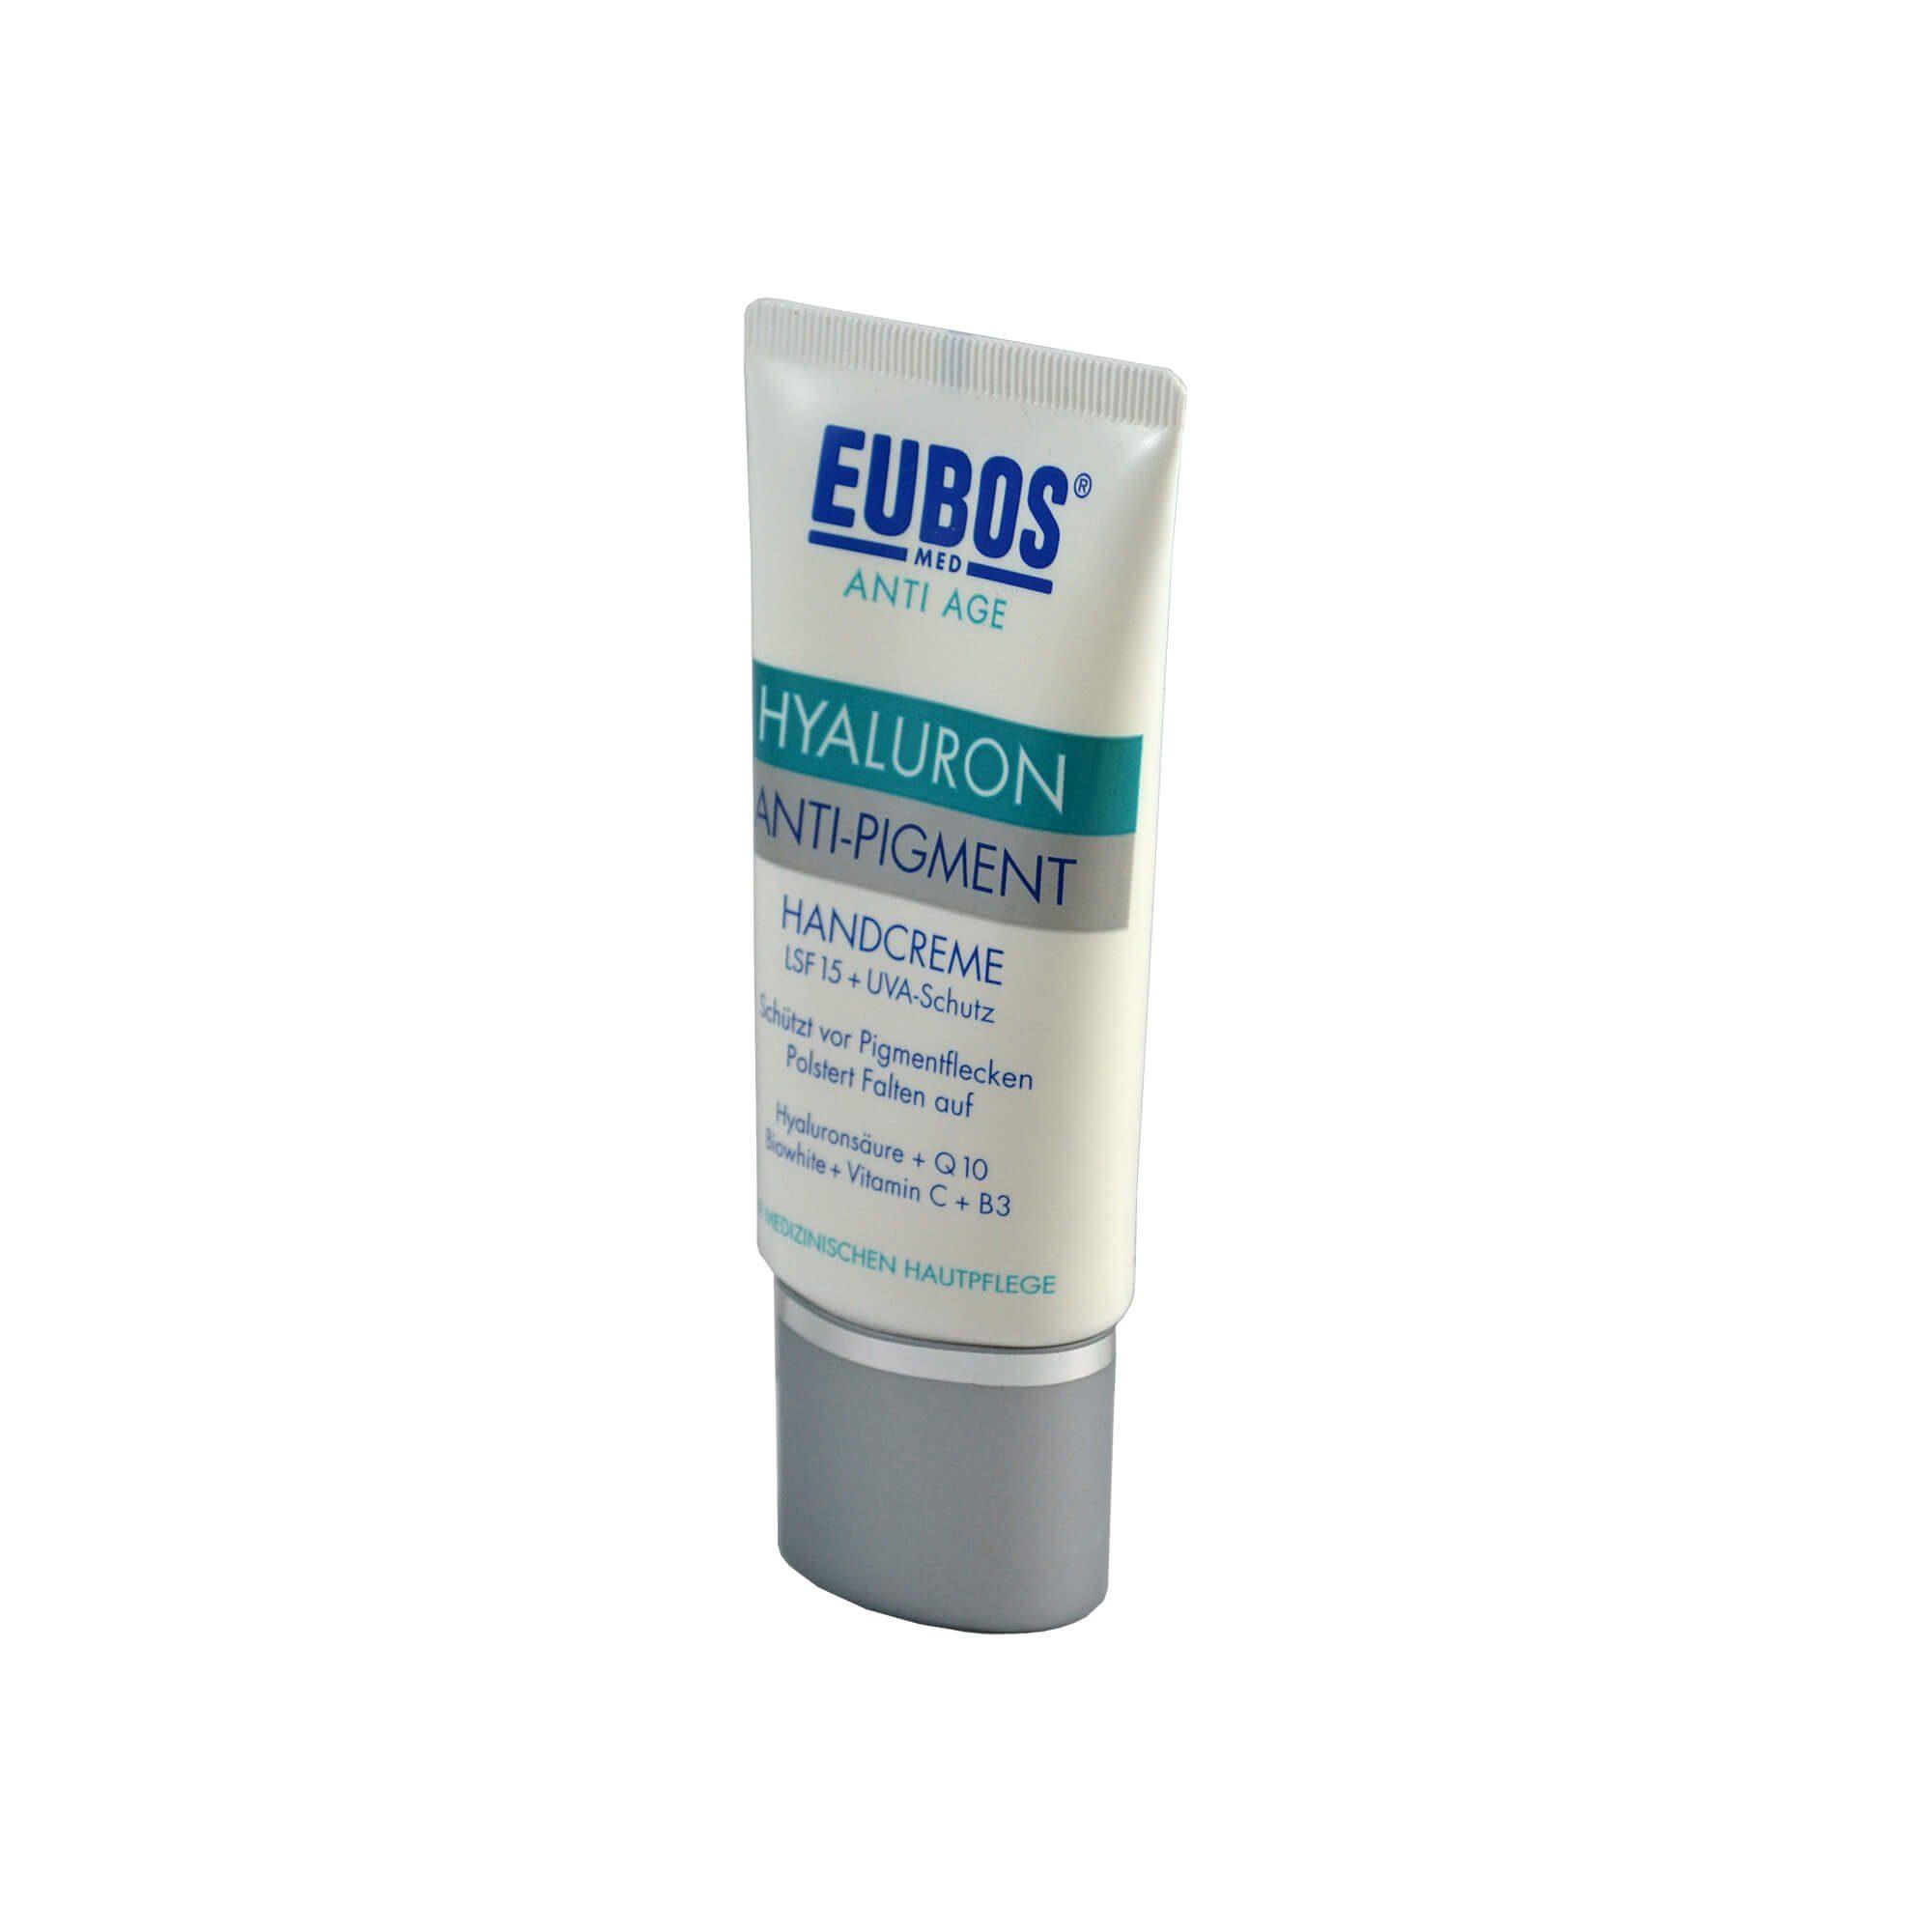 Eubos HYALURON Anti Pigment Handcreme LSF 15 , 50 ml